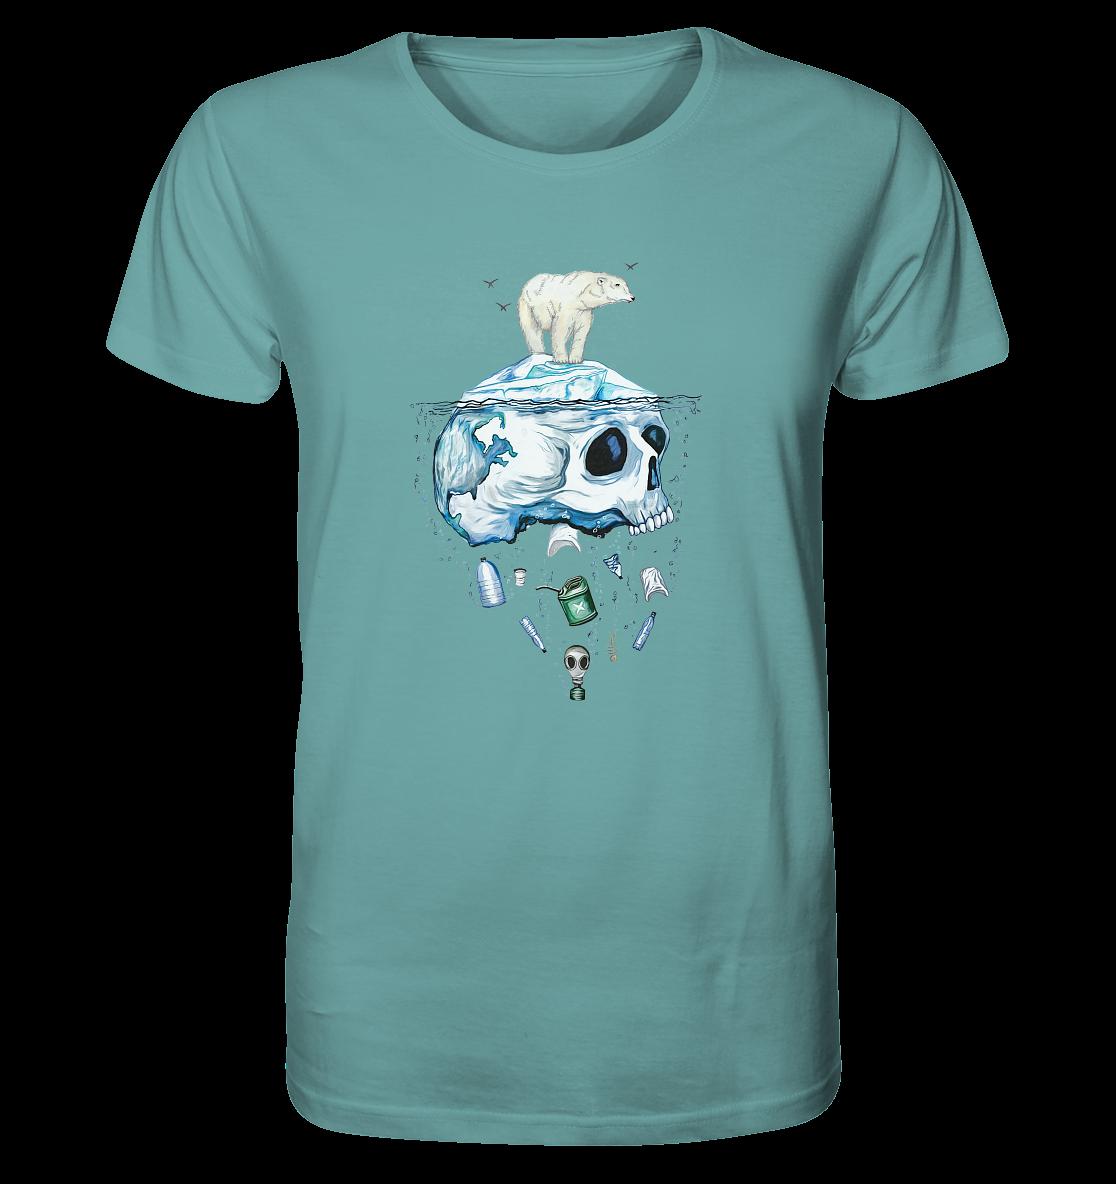 front-organic-shirt-70a7a7-1116x.png